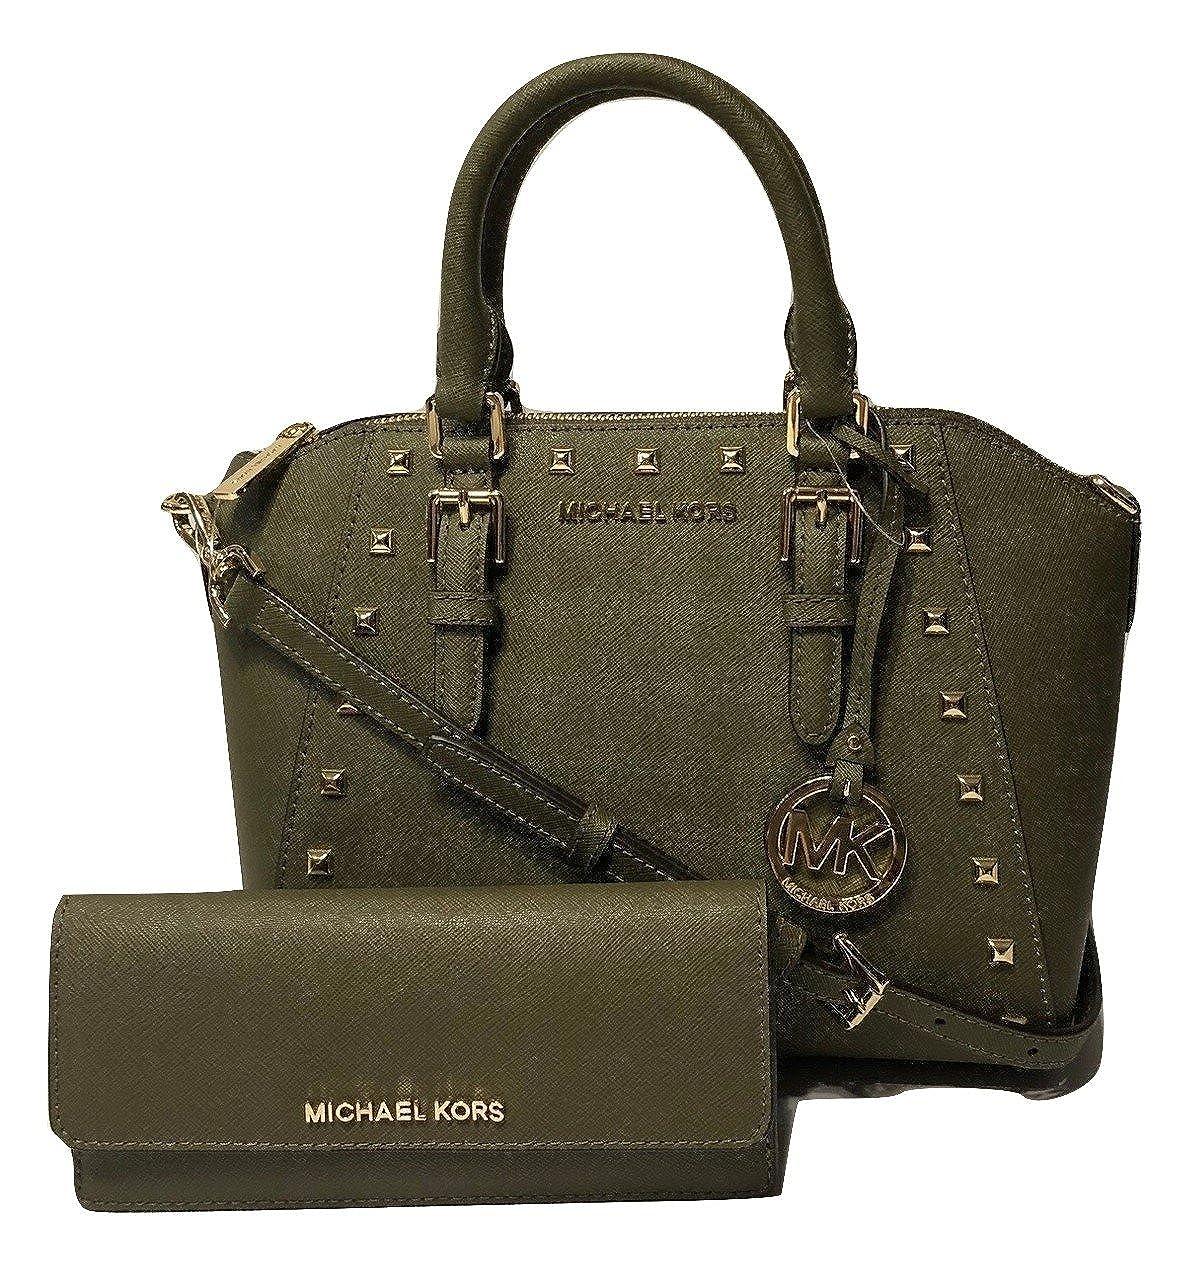 e927c6beba07 Michael Kors Ciara Studded MD Messenger Handbag bundled with Michael Kors  Jet Set Travel Flat Wallet (Olive)  Amazon.co.uk  Shoes   Bags